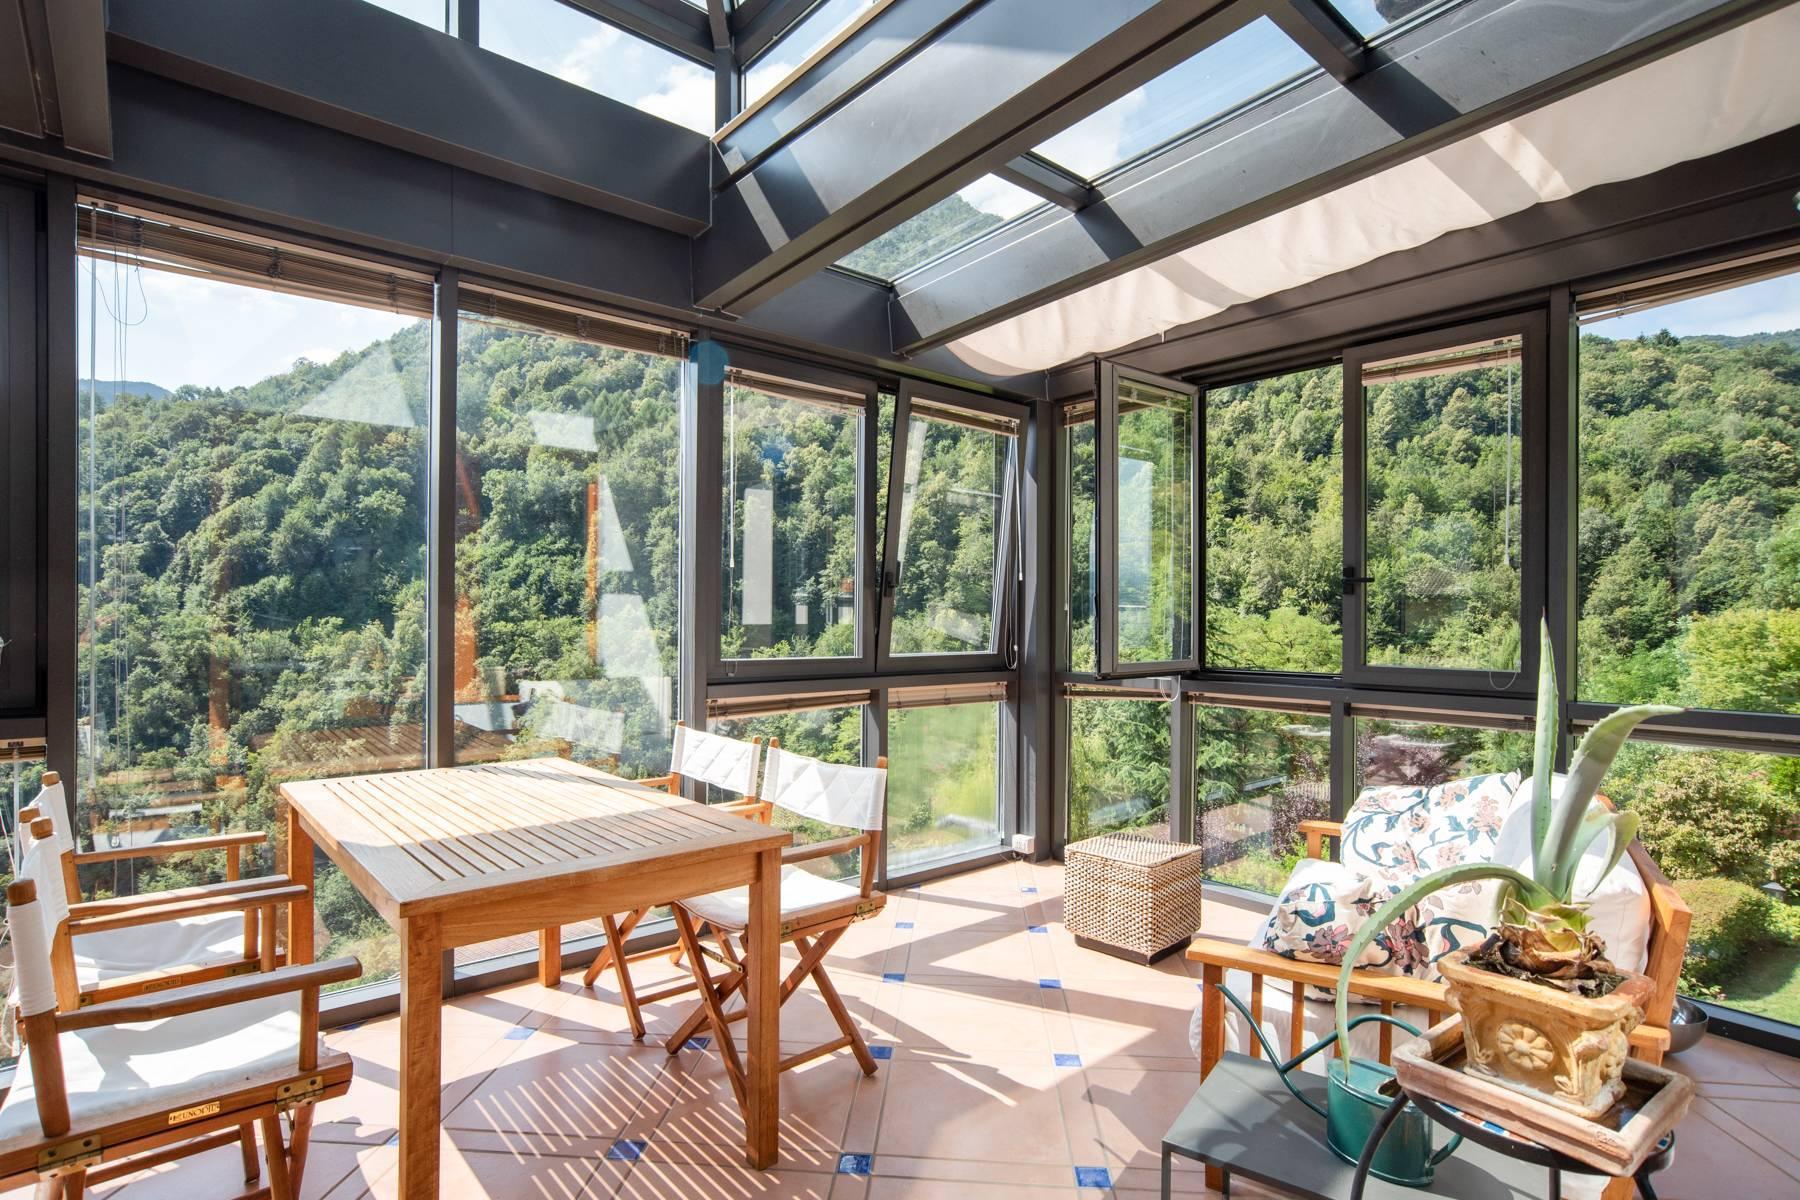 Splendida villa moderna sulla collina soleggiata sopra Argegno - 18